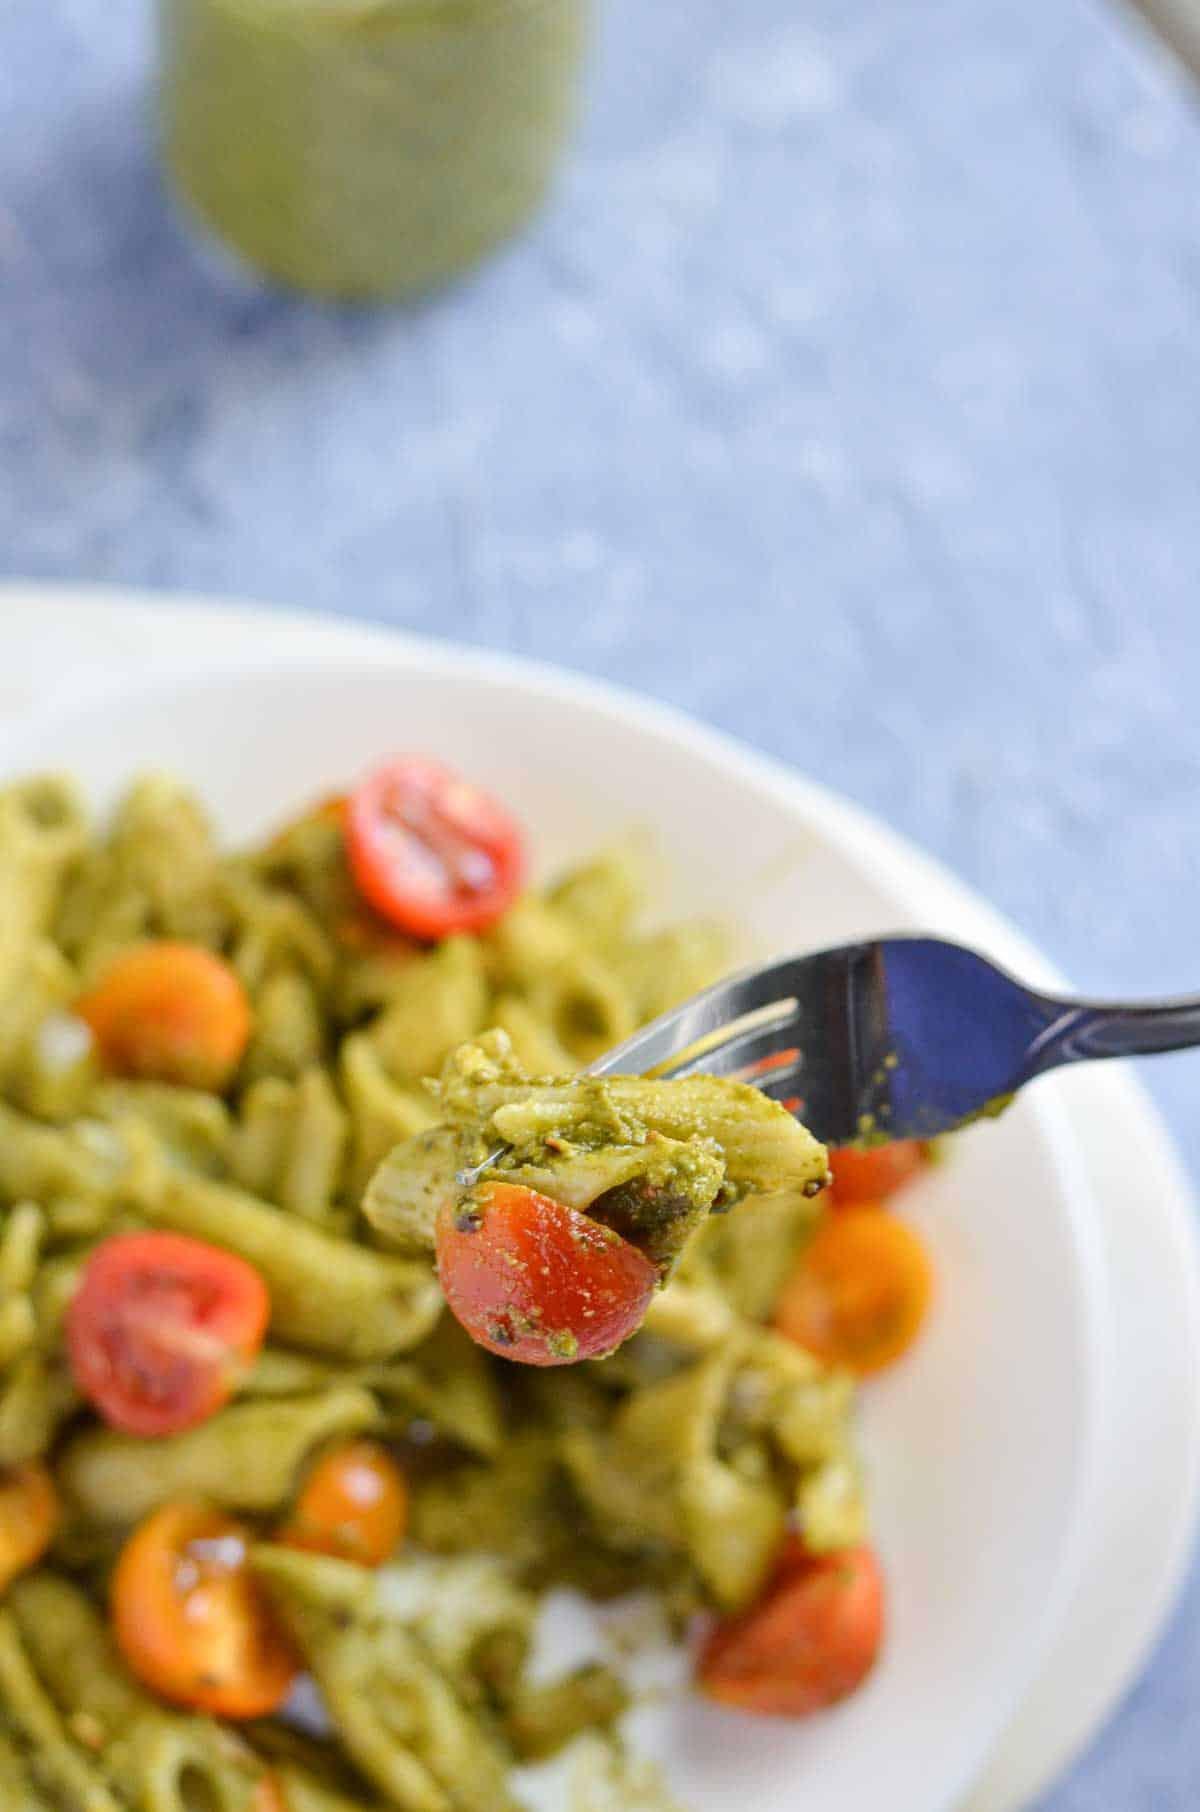 make pasta with the poblano pesto